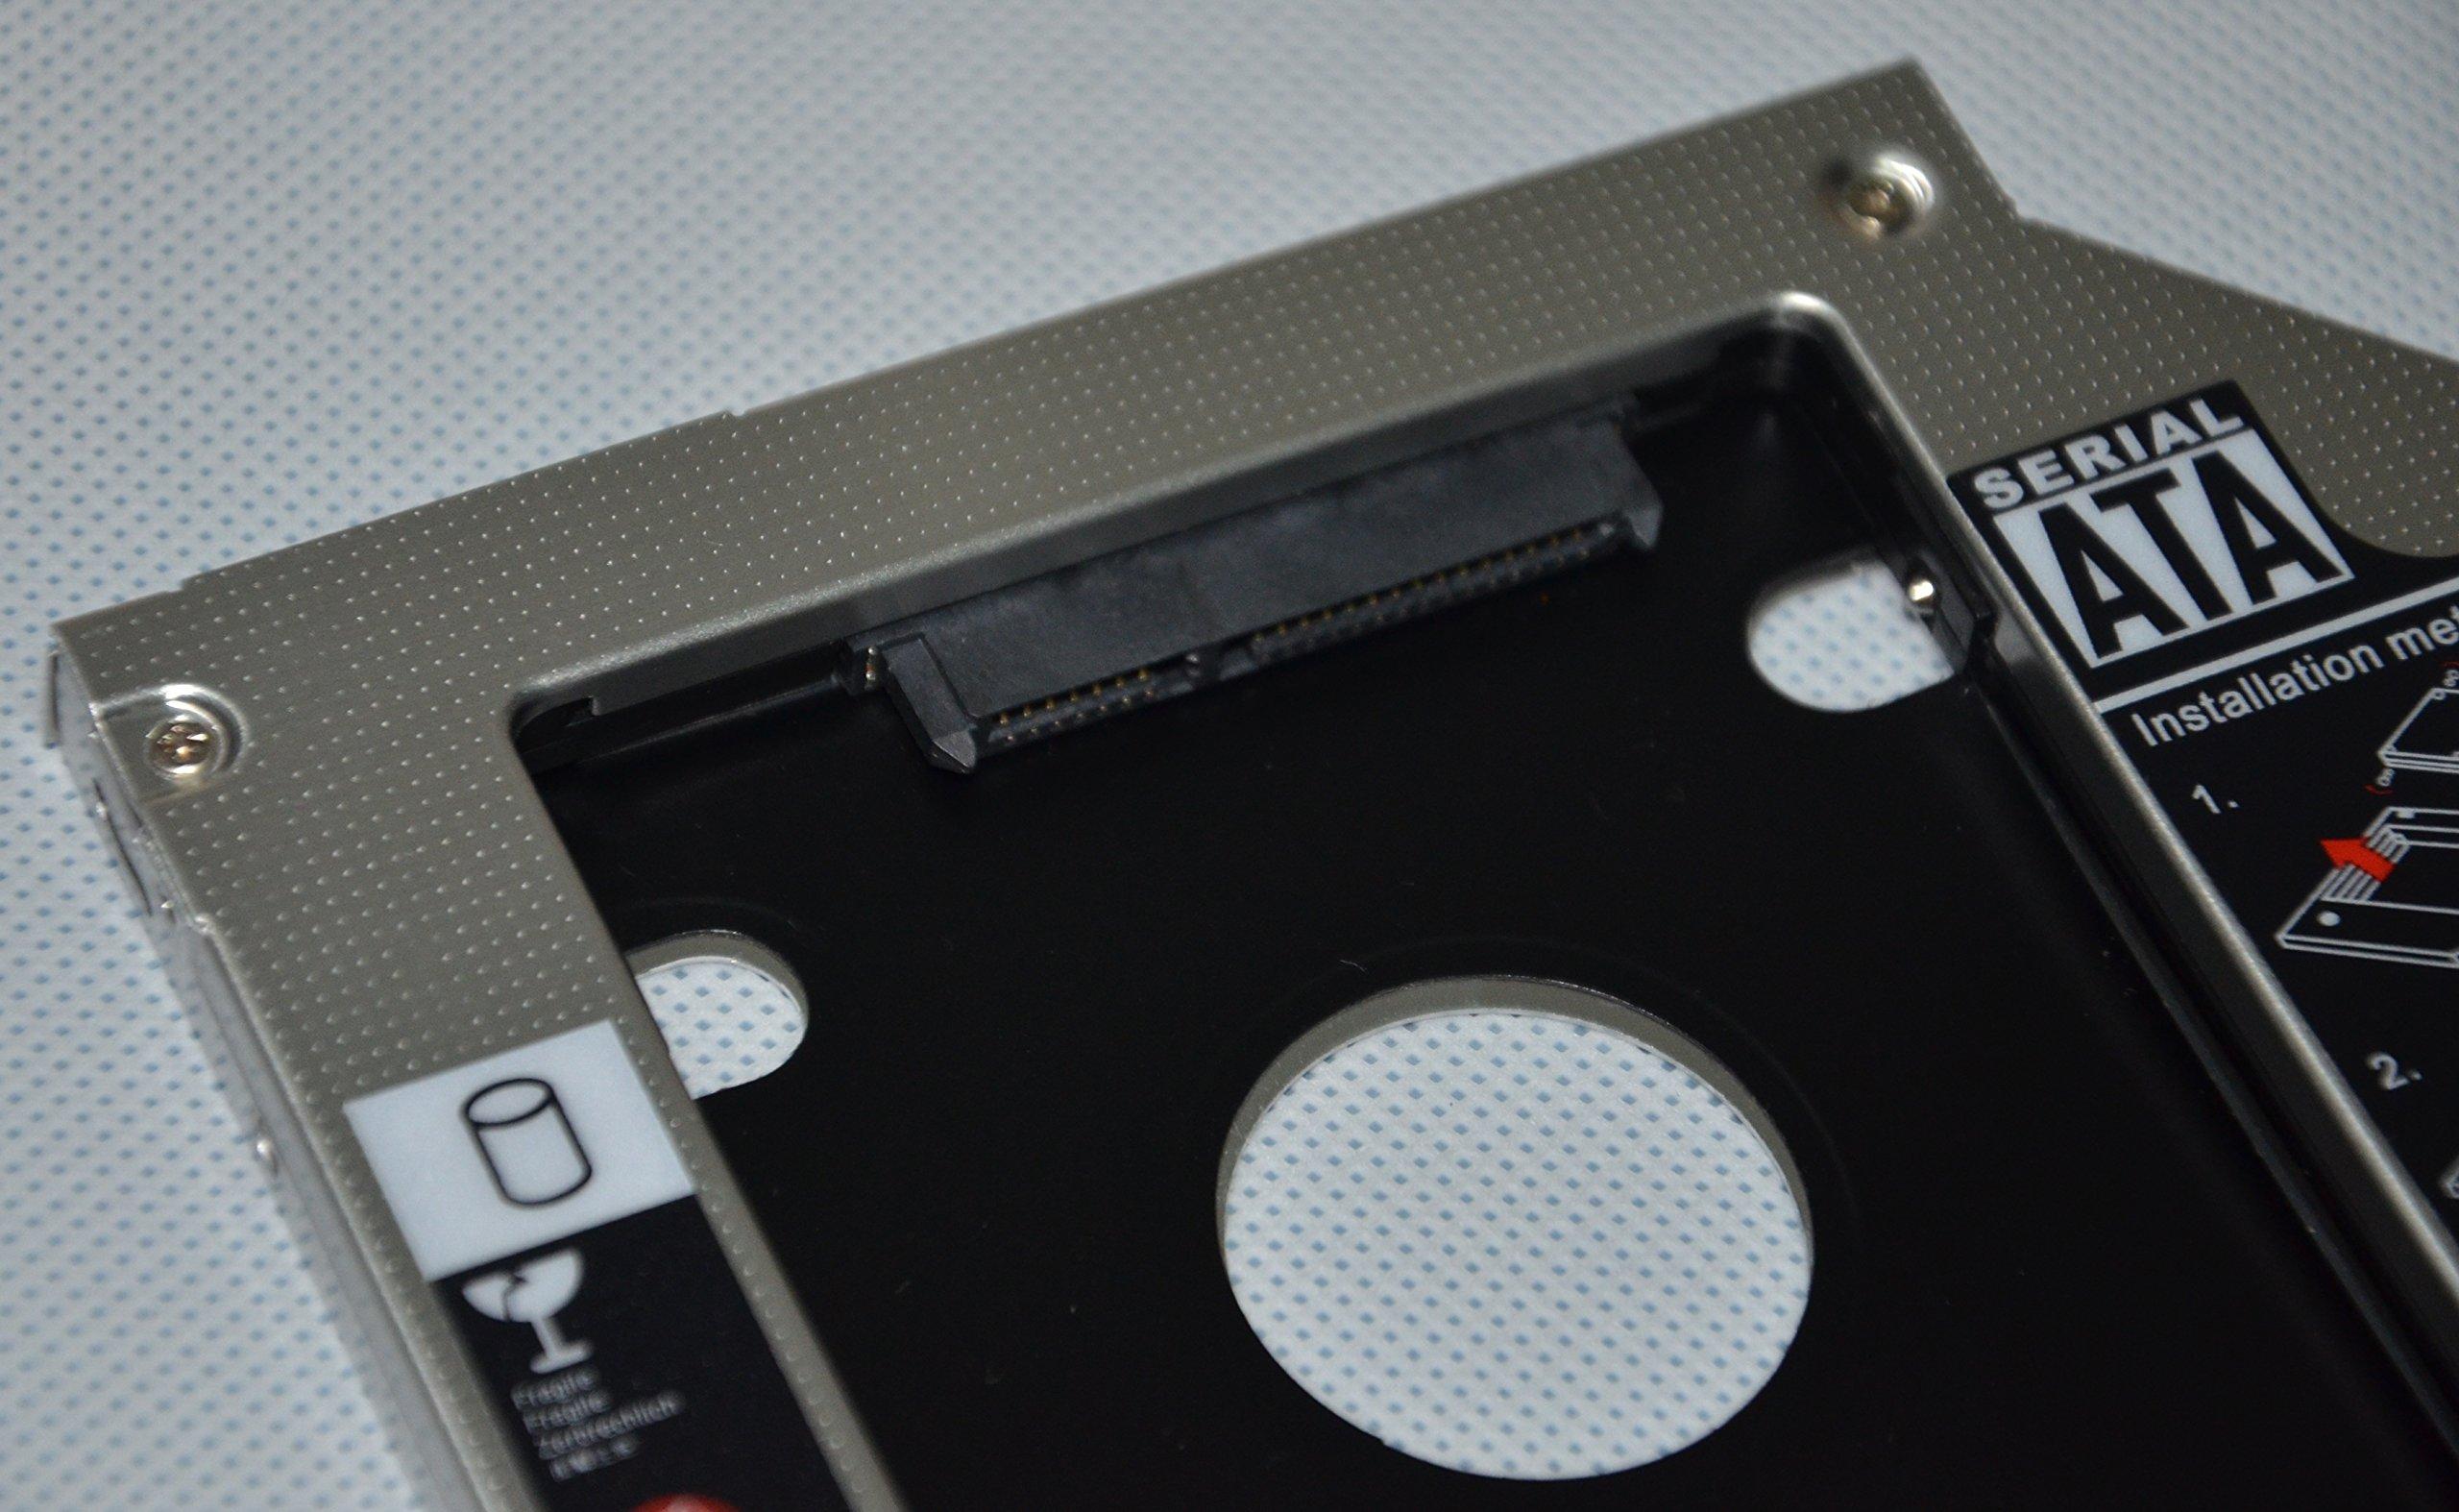 Deyoung 2nd HDD SSD Caddy Adapter for Dell Latitude E6420 E6520 E6320 E6430 E6530 E6330 by De Young (Image #2)